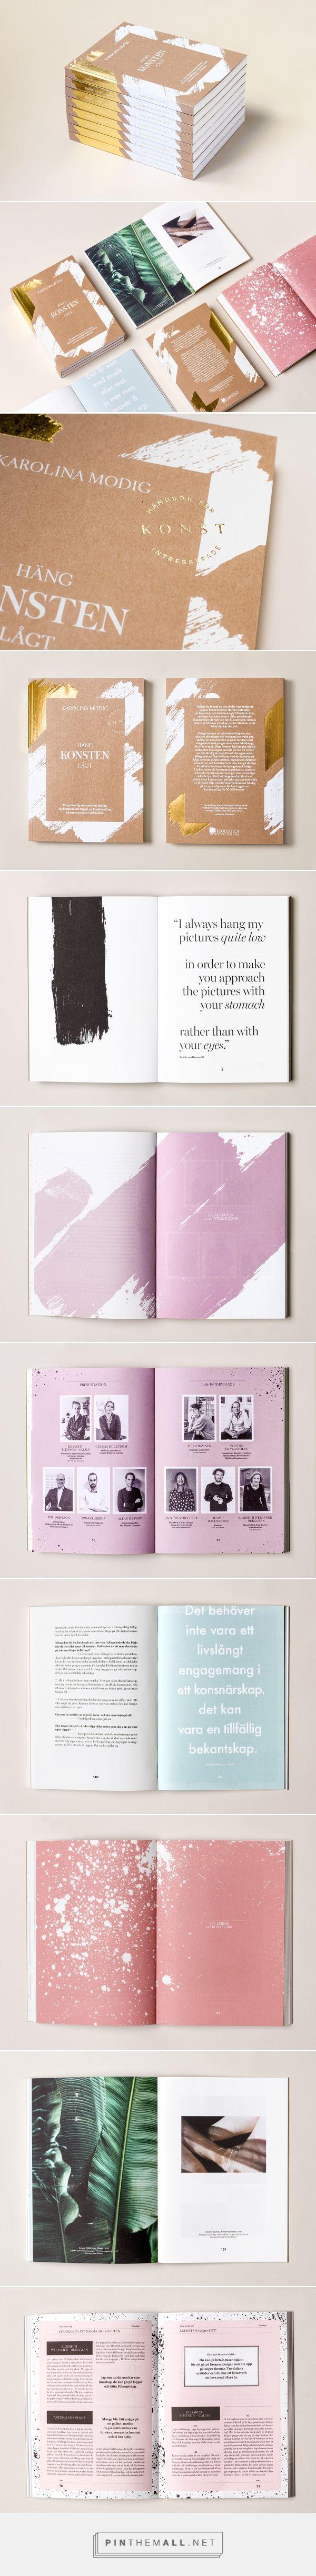 Best 25 Publication Design Ideas On Pinterest Booklet